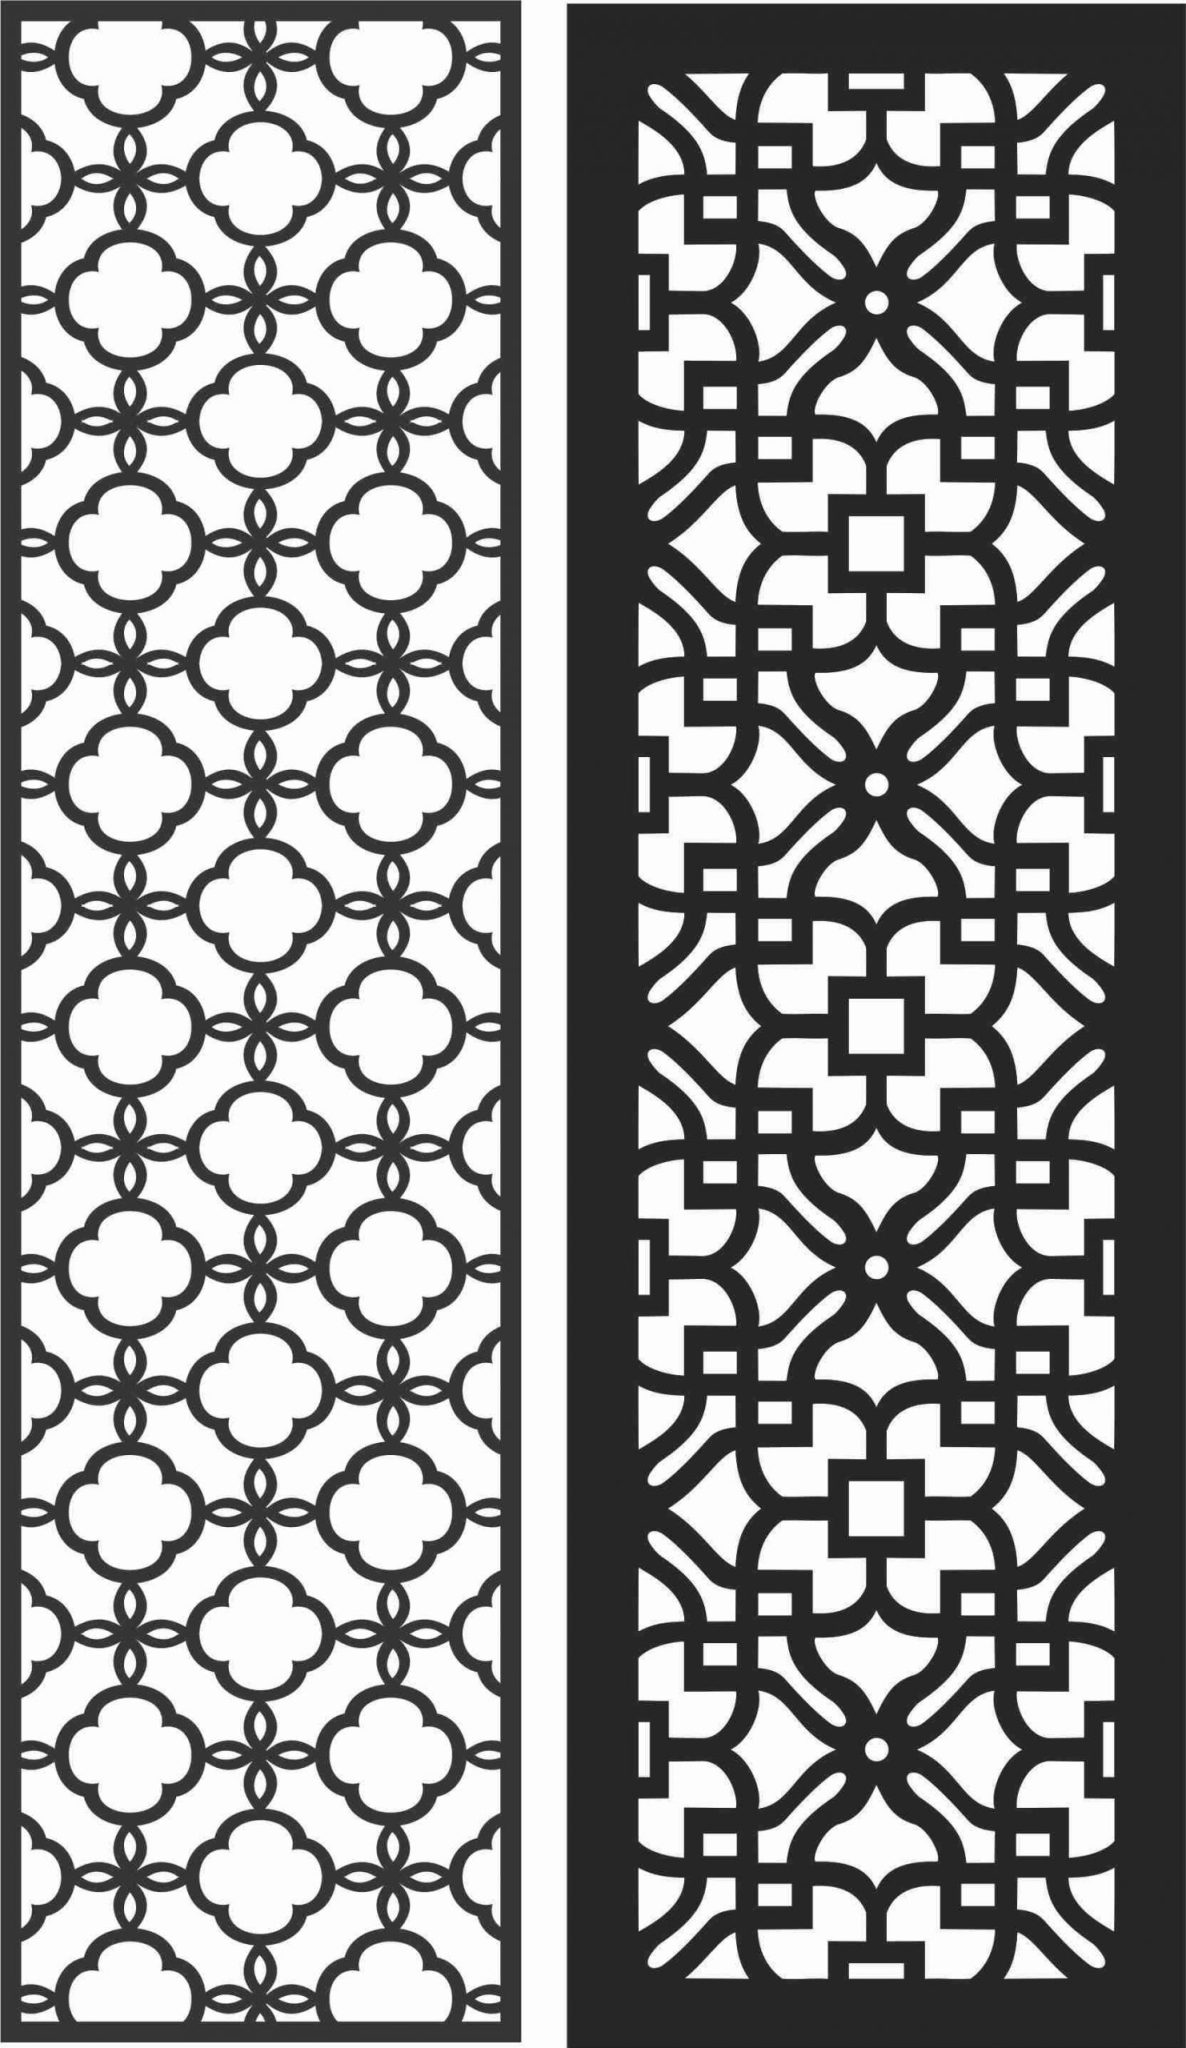 Screen Panel Patterns Seamless 79 Free DXF File